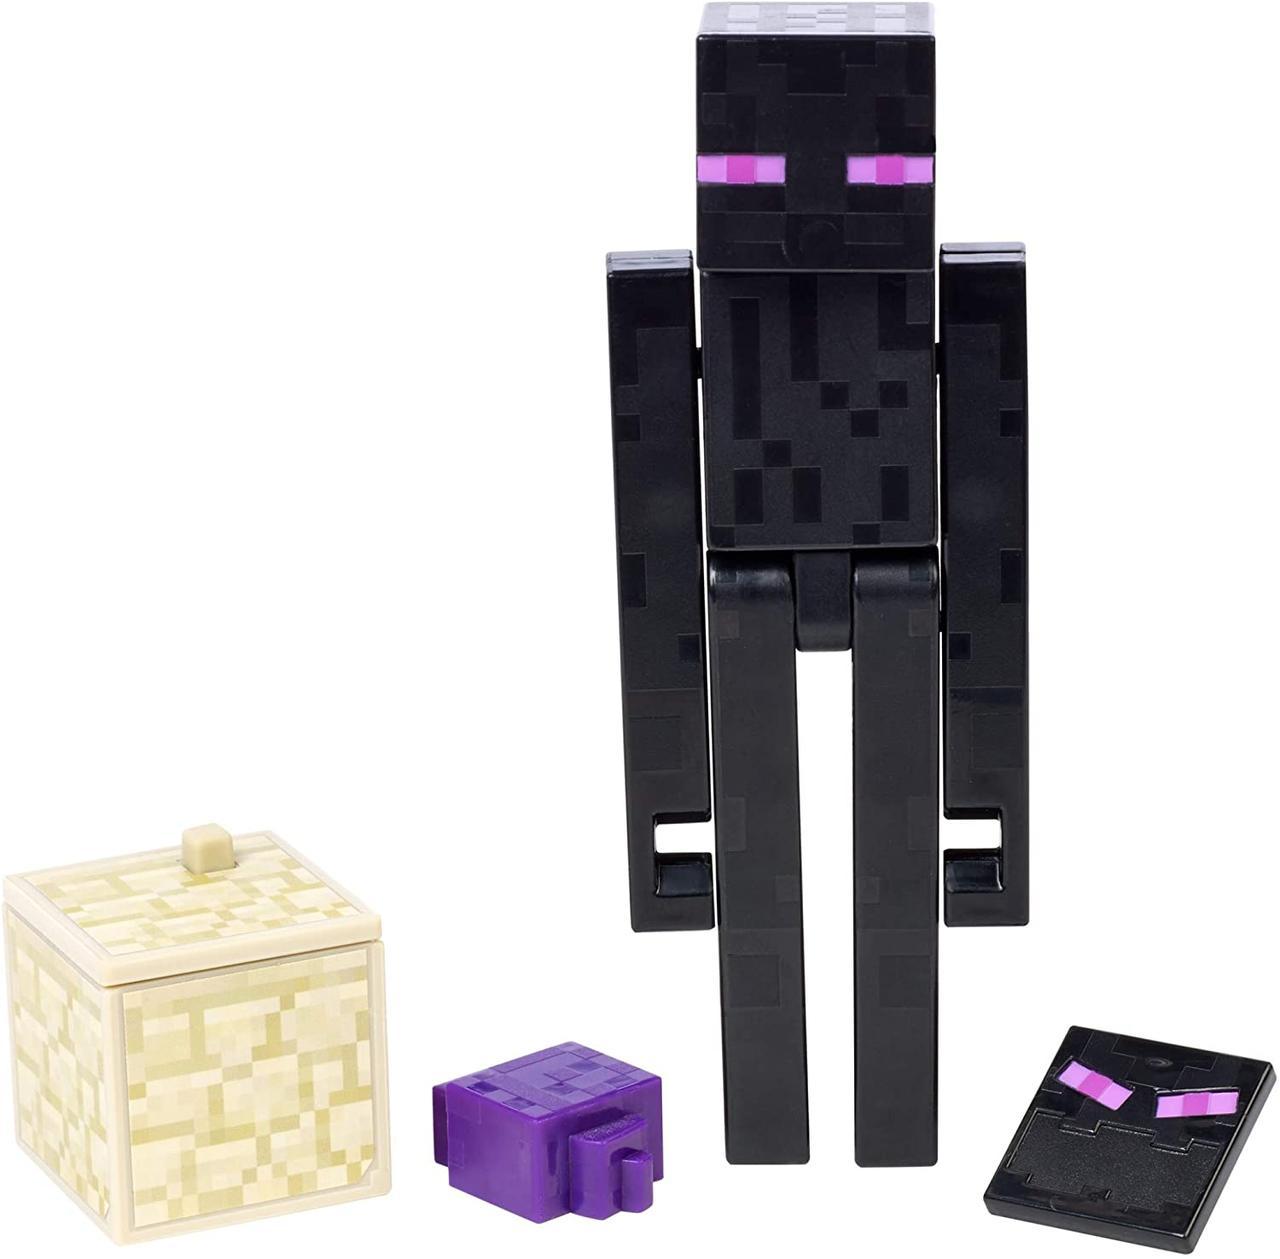 Фигурка Эндермен Майнкрафт Minecraft Comic Maker Enderman оригинал Mattel